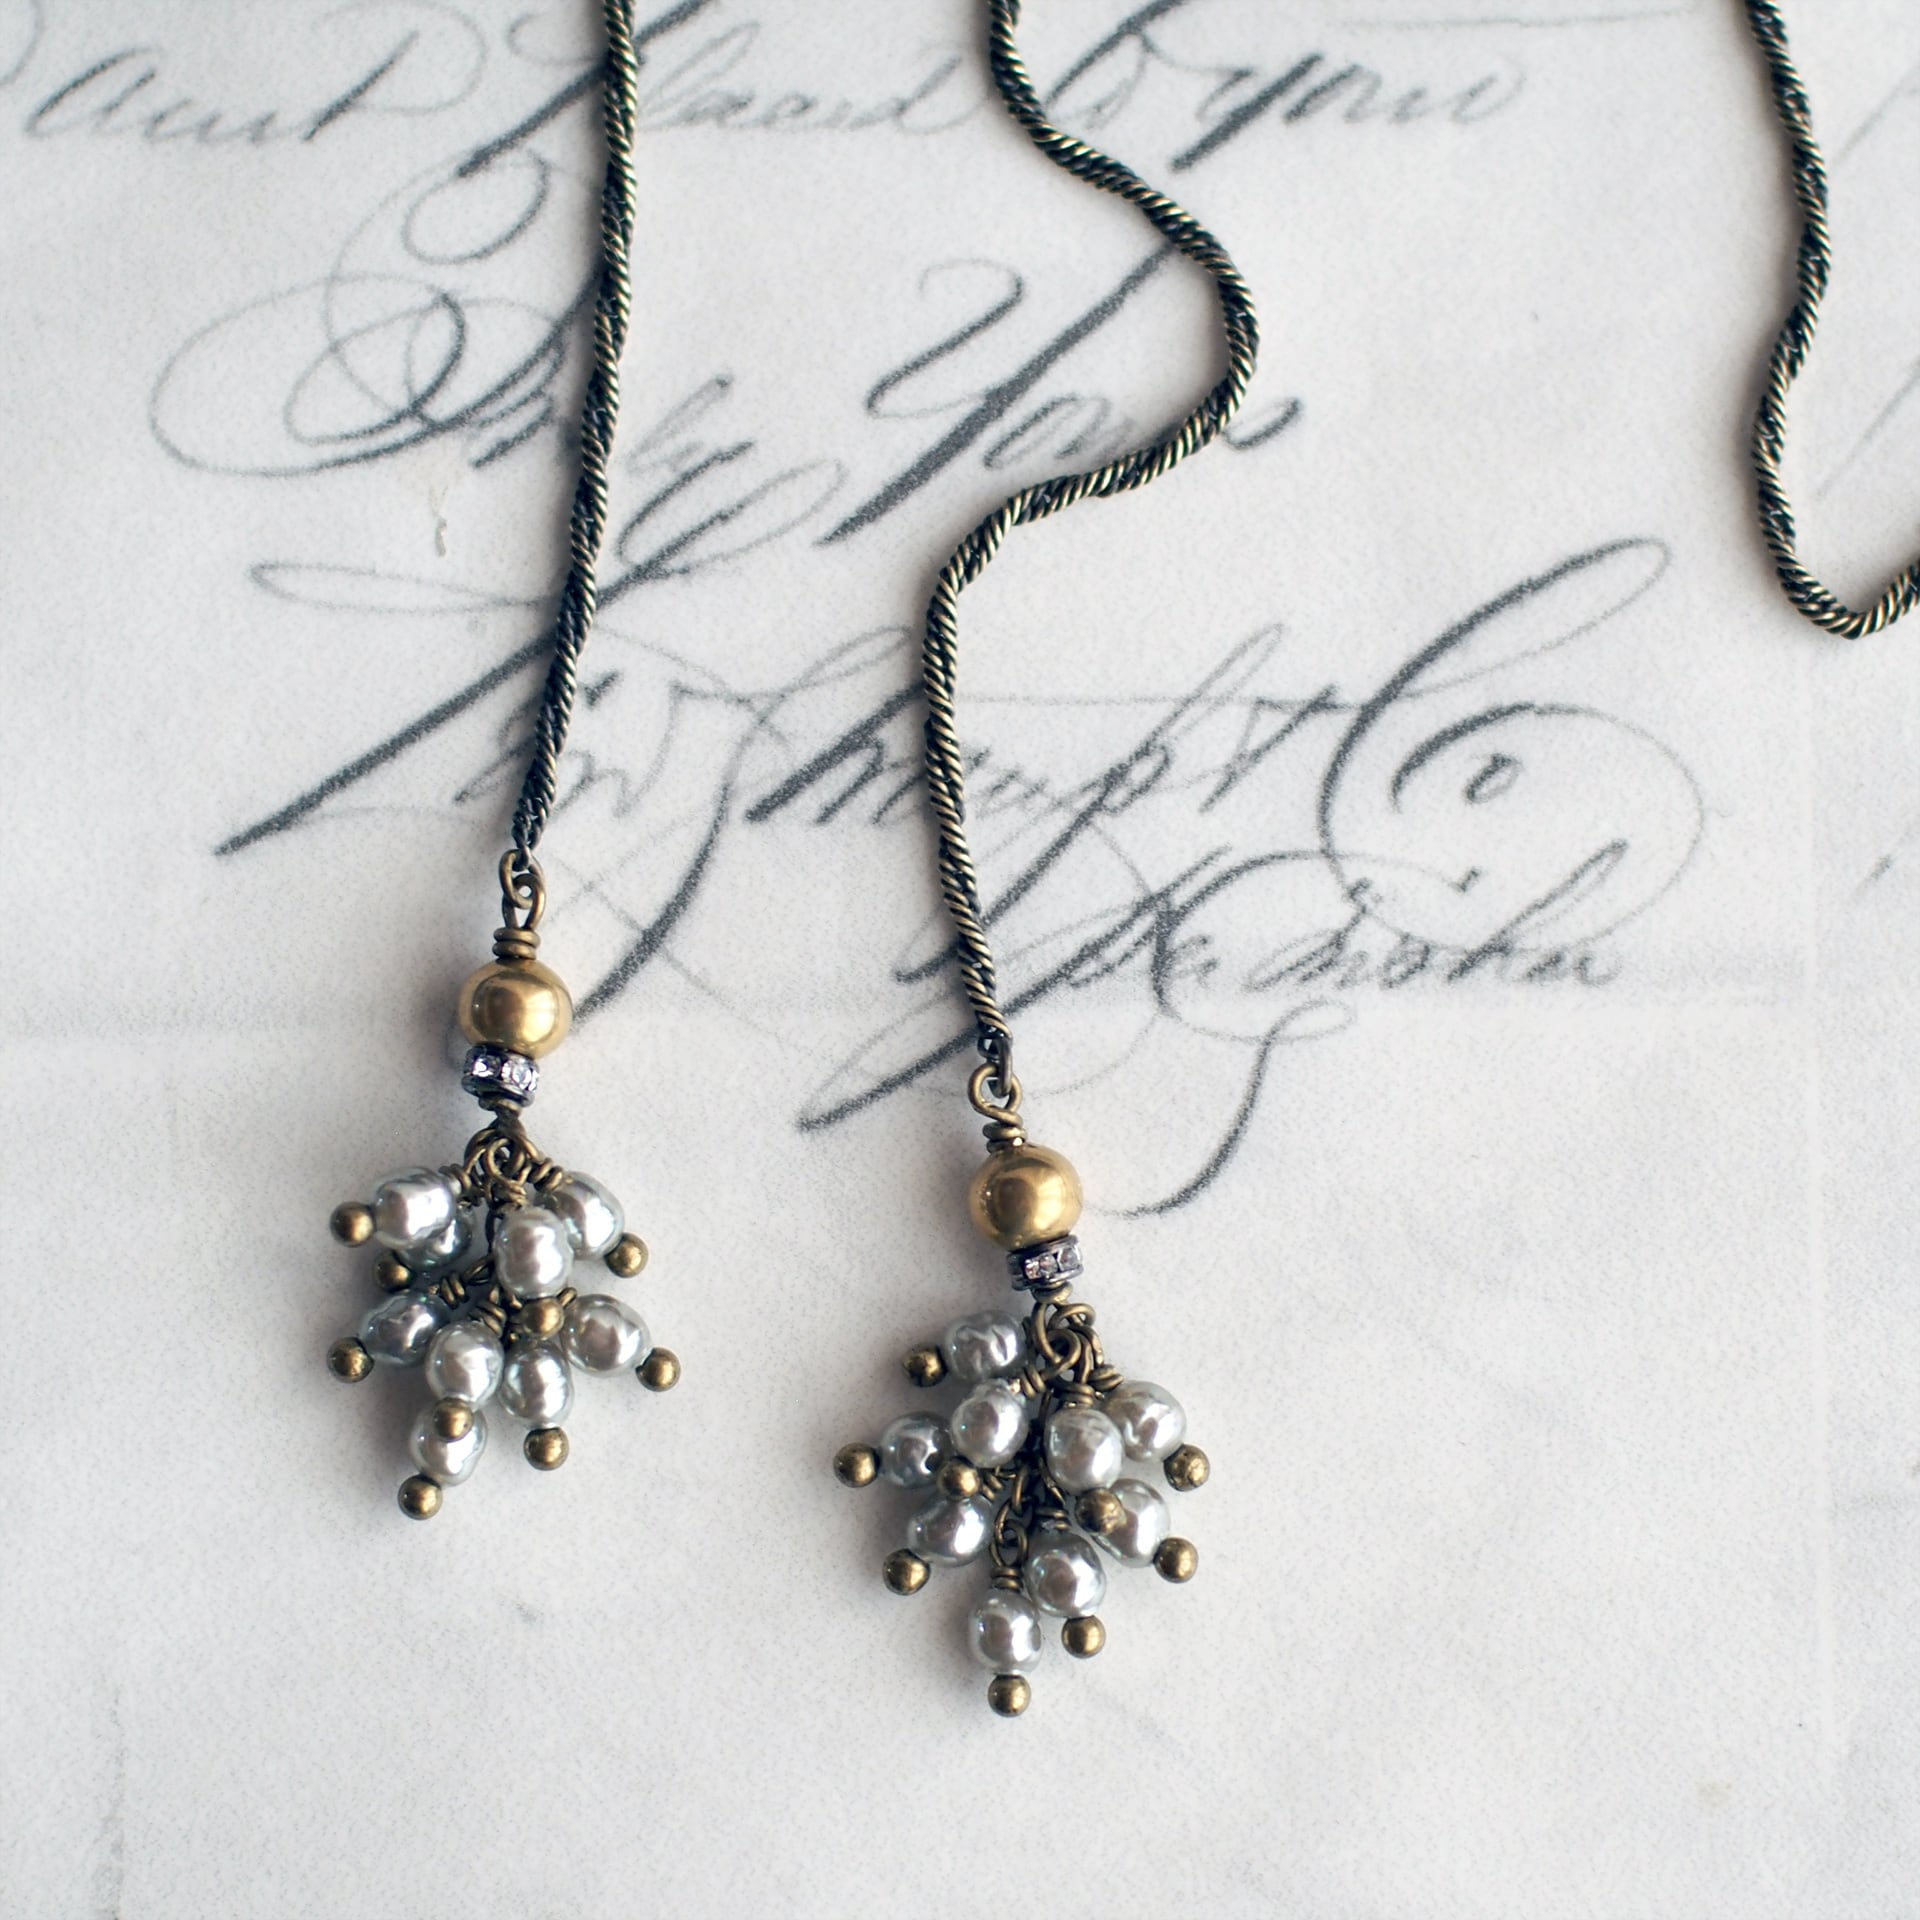 【K様専用】カーテンコール / タッセルラリエット ネックレス (GlassPearl・SilverS)